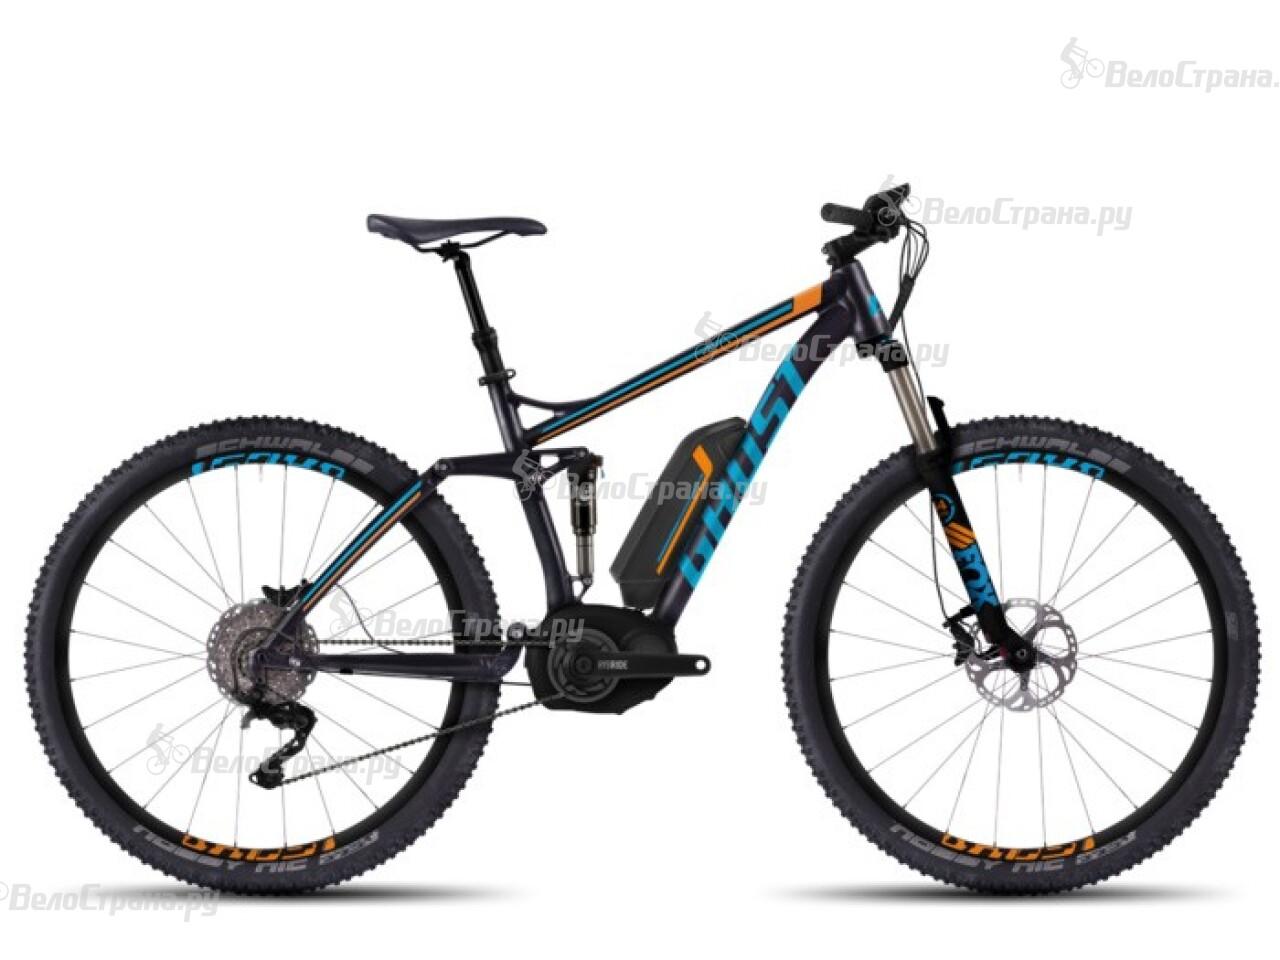 Велосипед Ghost Teru FS 9 (2016) велосипед challenger mission lux fs 26 черно красный 16